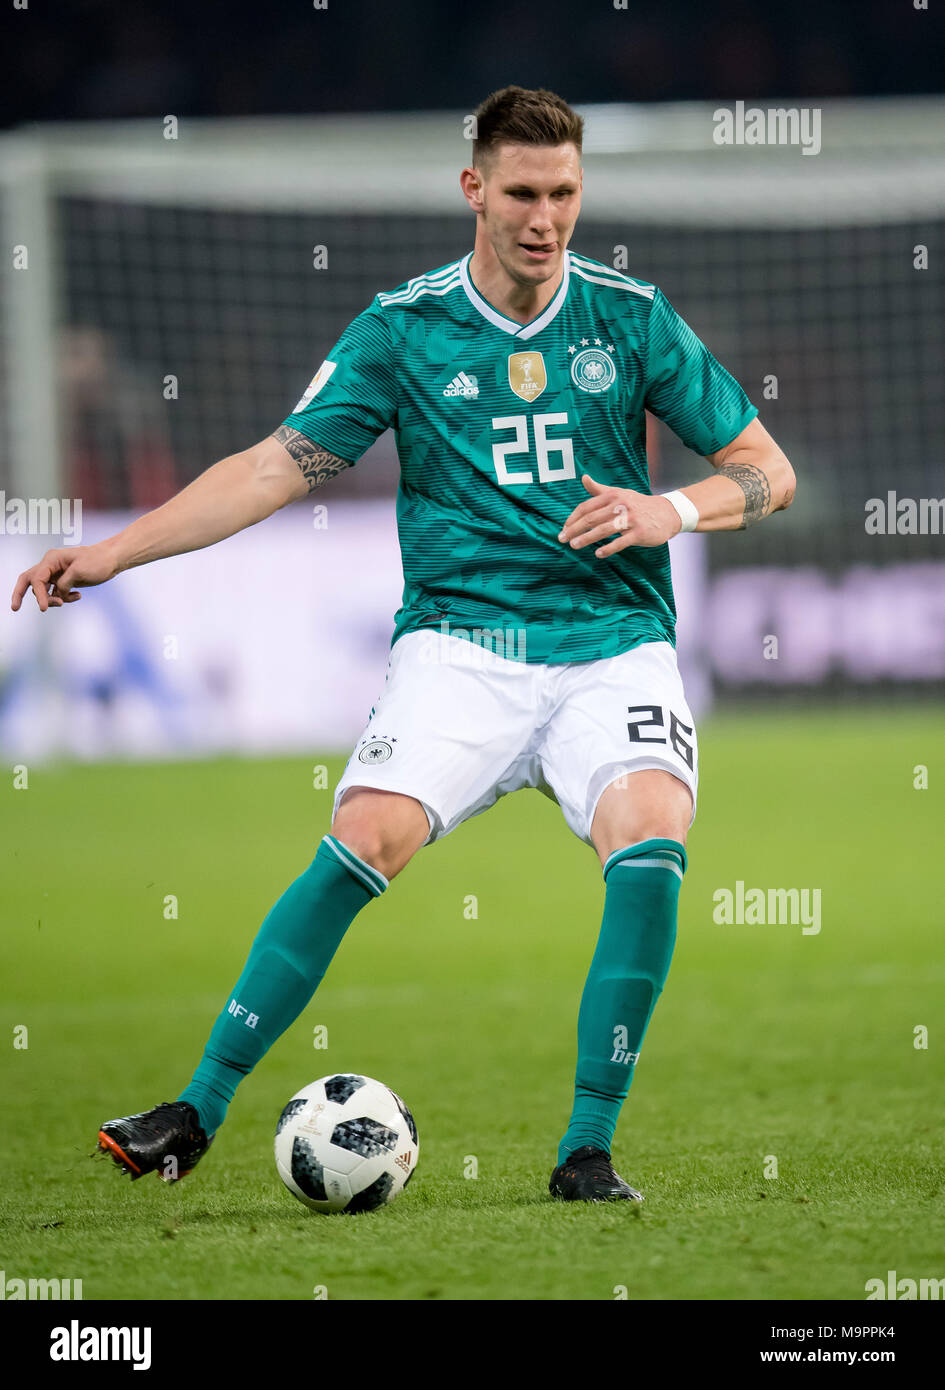 Niklas Suele (Germany) am Ball  GES/ Fussball/ Freundschaftsspiel: Germany - Brasilien, 27.03.2018  Football / Soccer: Friendly Match: Germany vs Brazil, Berlin, March 27, 2018 |usage worldwide - Stock Image